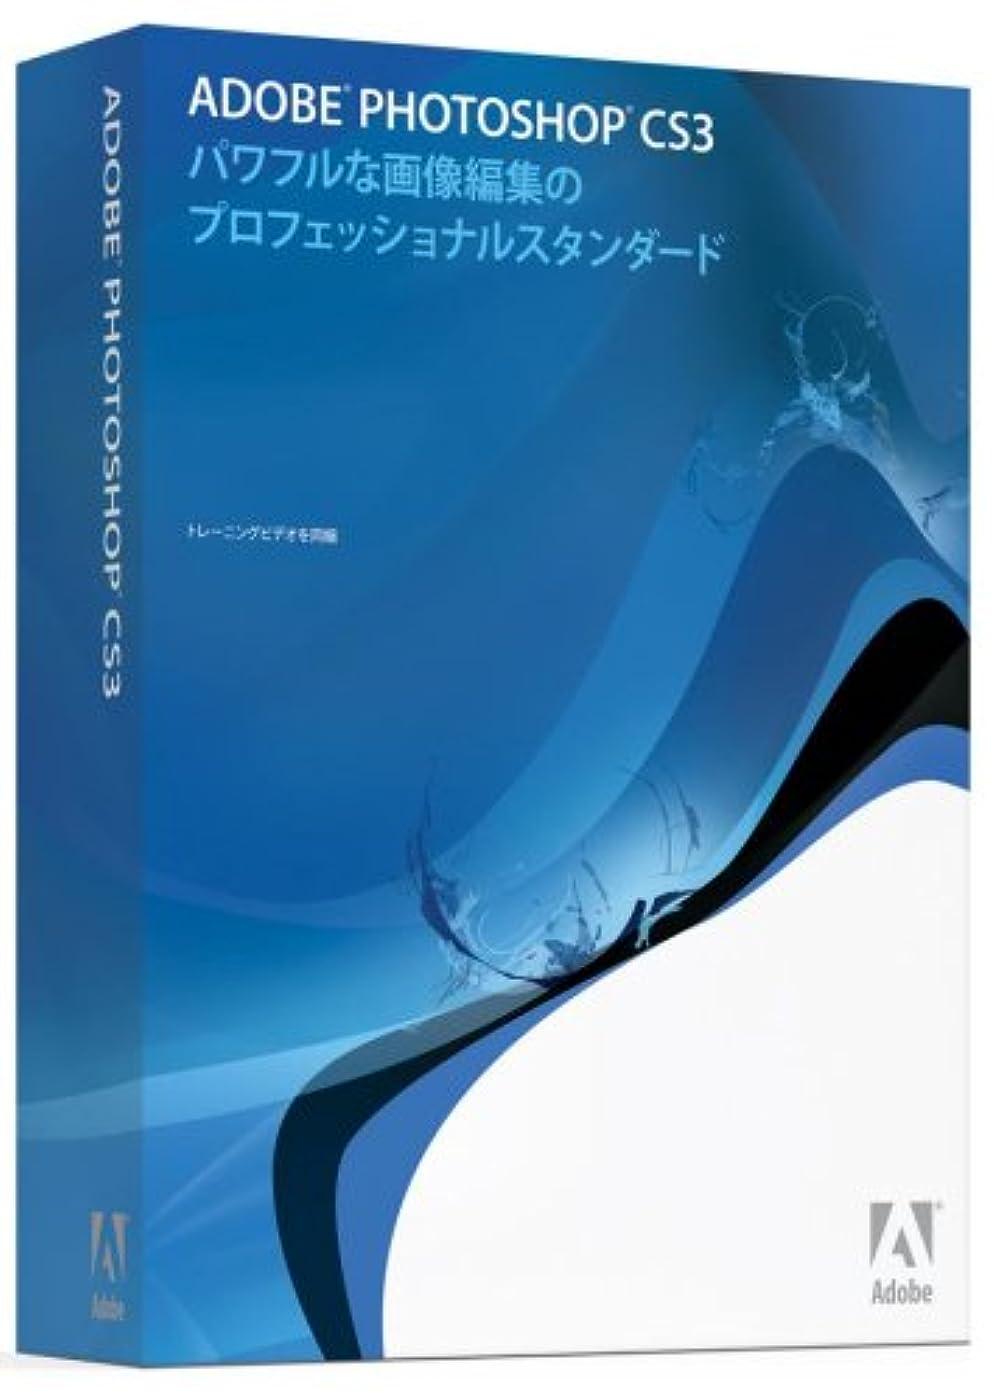 貯水池粒子エネルギーPhotoshop CS3 日本語版 Windows版 (旧製品)